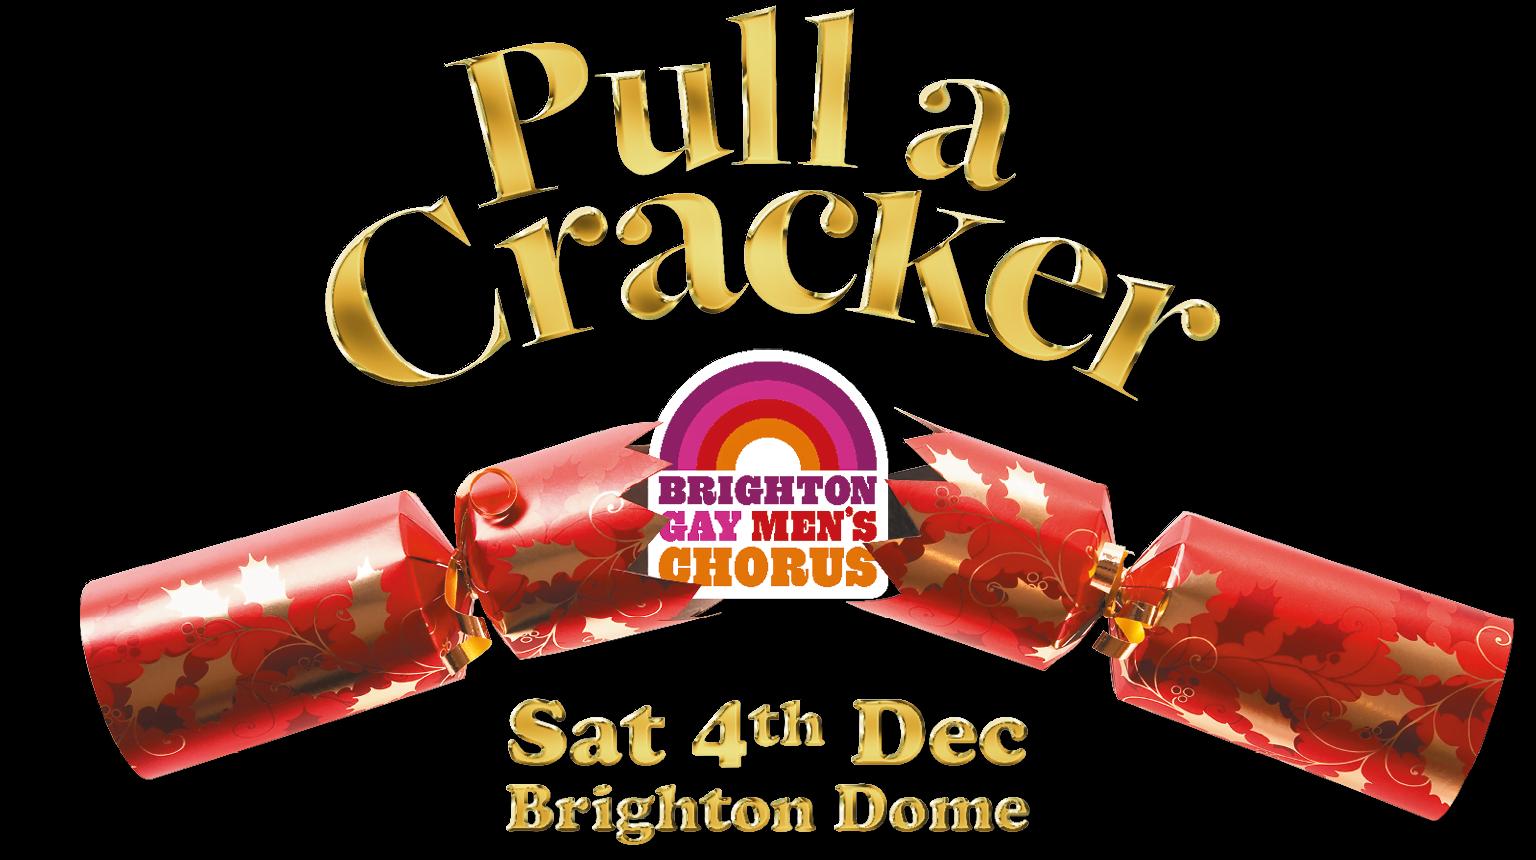 Pull A Cracker with Brighton Gay Men's Chorus Sat 4th December Brighton Dome